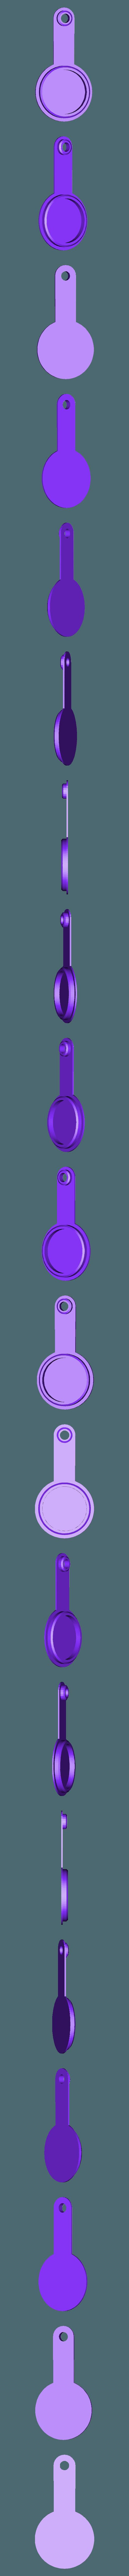 TORTUGA_Macho_Slim.stl Télécharger fichier STL gratuit LLAVERO CELTA DE VIGO, REAL MADRID, BARCELONA, ATLETICO DE MADRID Y TORTUGA (NFC) • Modèle imprimable en 3D, celtarra12